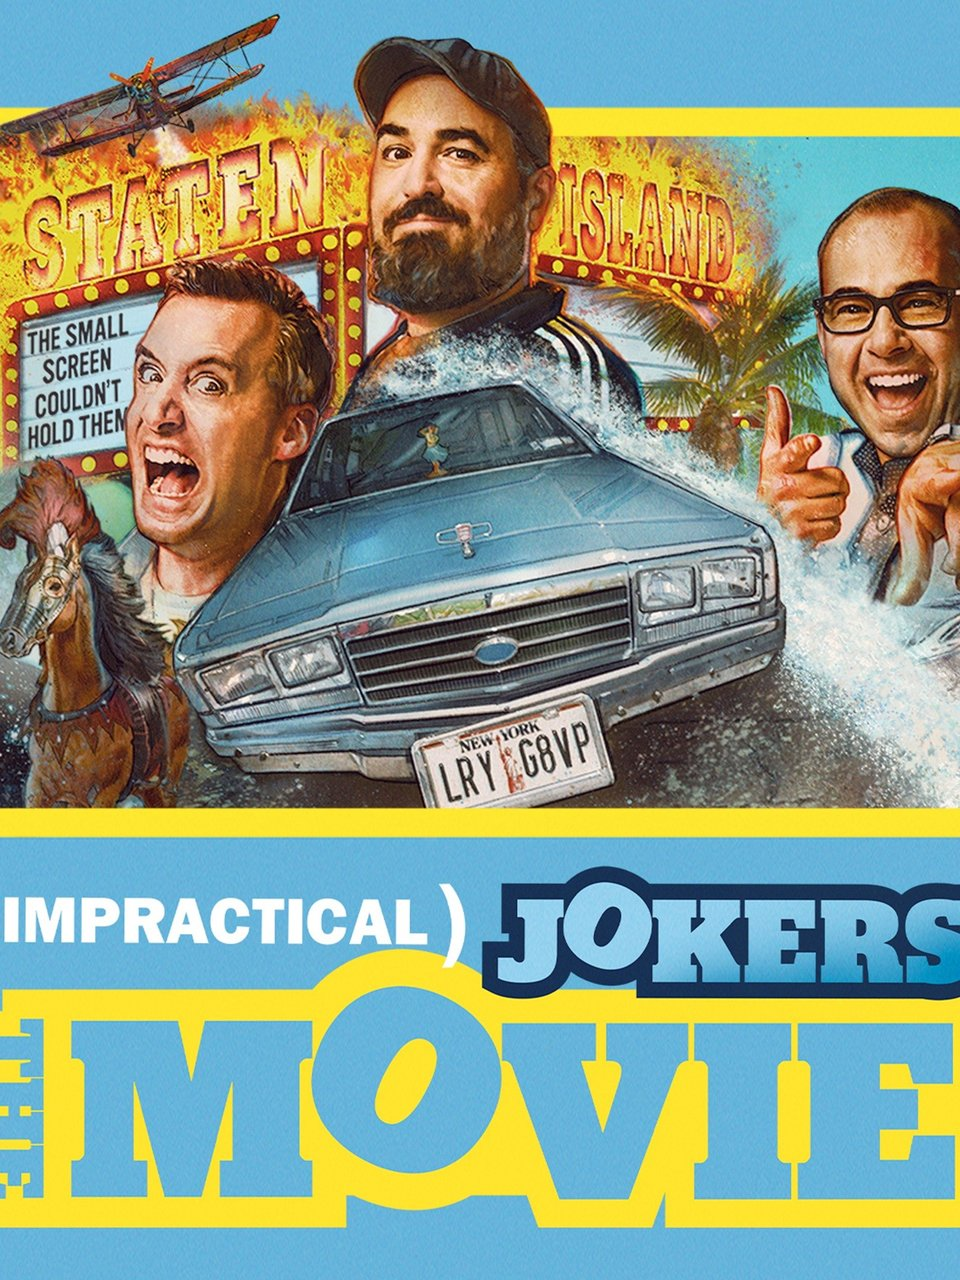 Movie Details Impractical Jokers The Movie Entertaining @KoolGadgetz.com